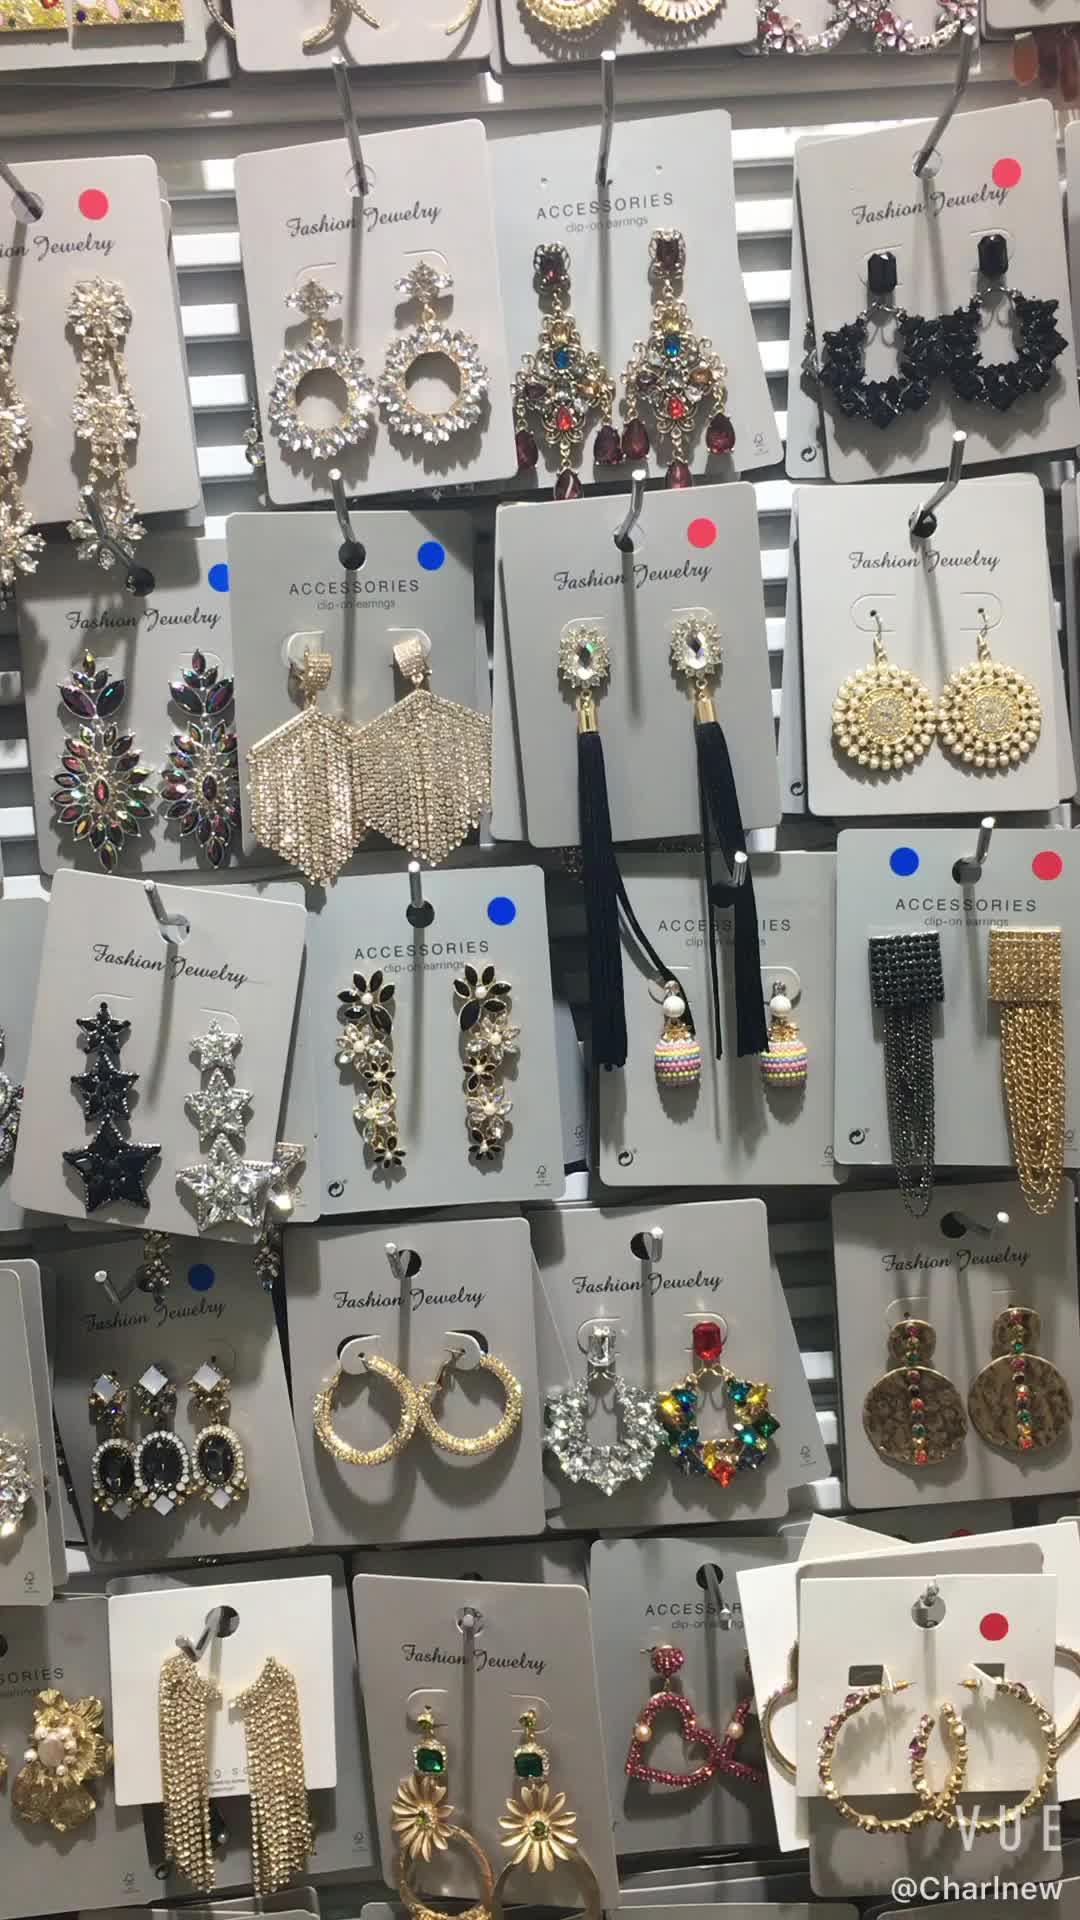 Kaimei ZA 웨딩 쥬얼리 30 디자인 매달려 진술 귀걸이 한국 패션 핑크 수지 드롭 귀걸이